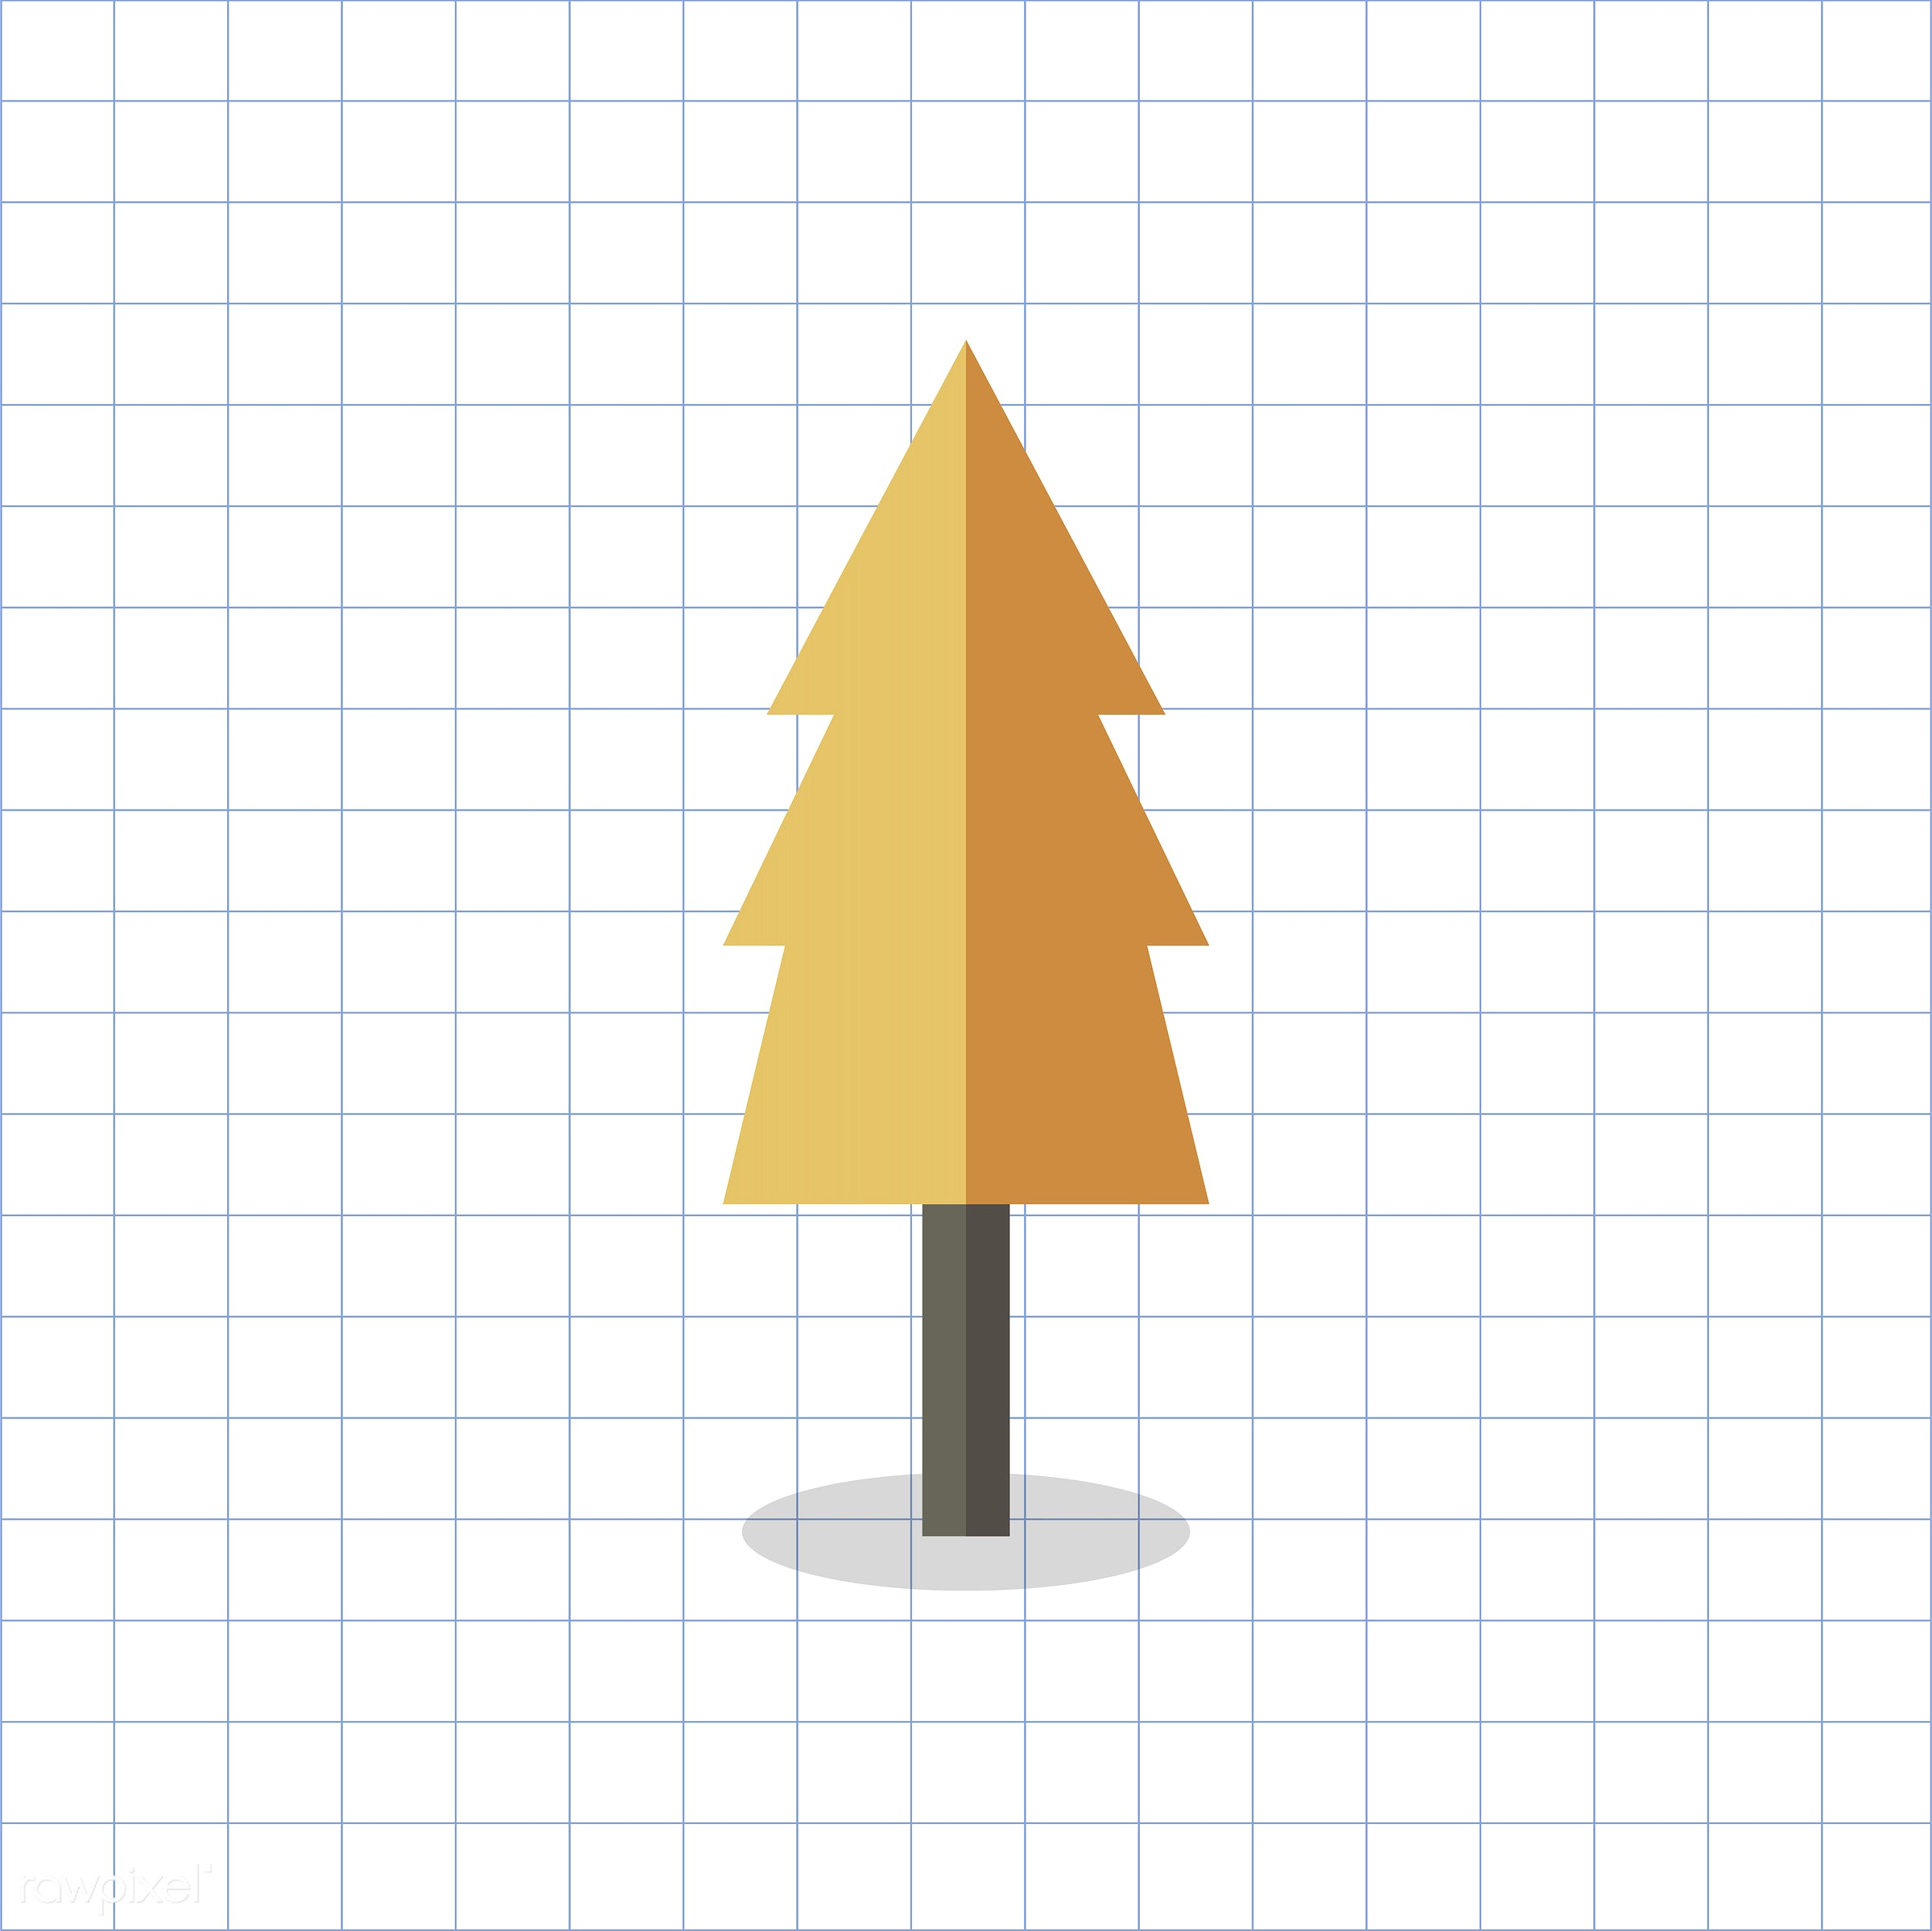 vector, graphic, illustration, icon, symbol, colorful, cute, plant, tree, nature, fall, autumn, orange